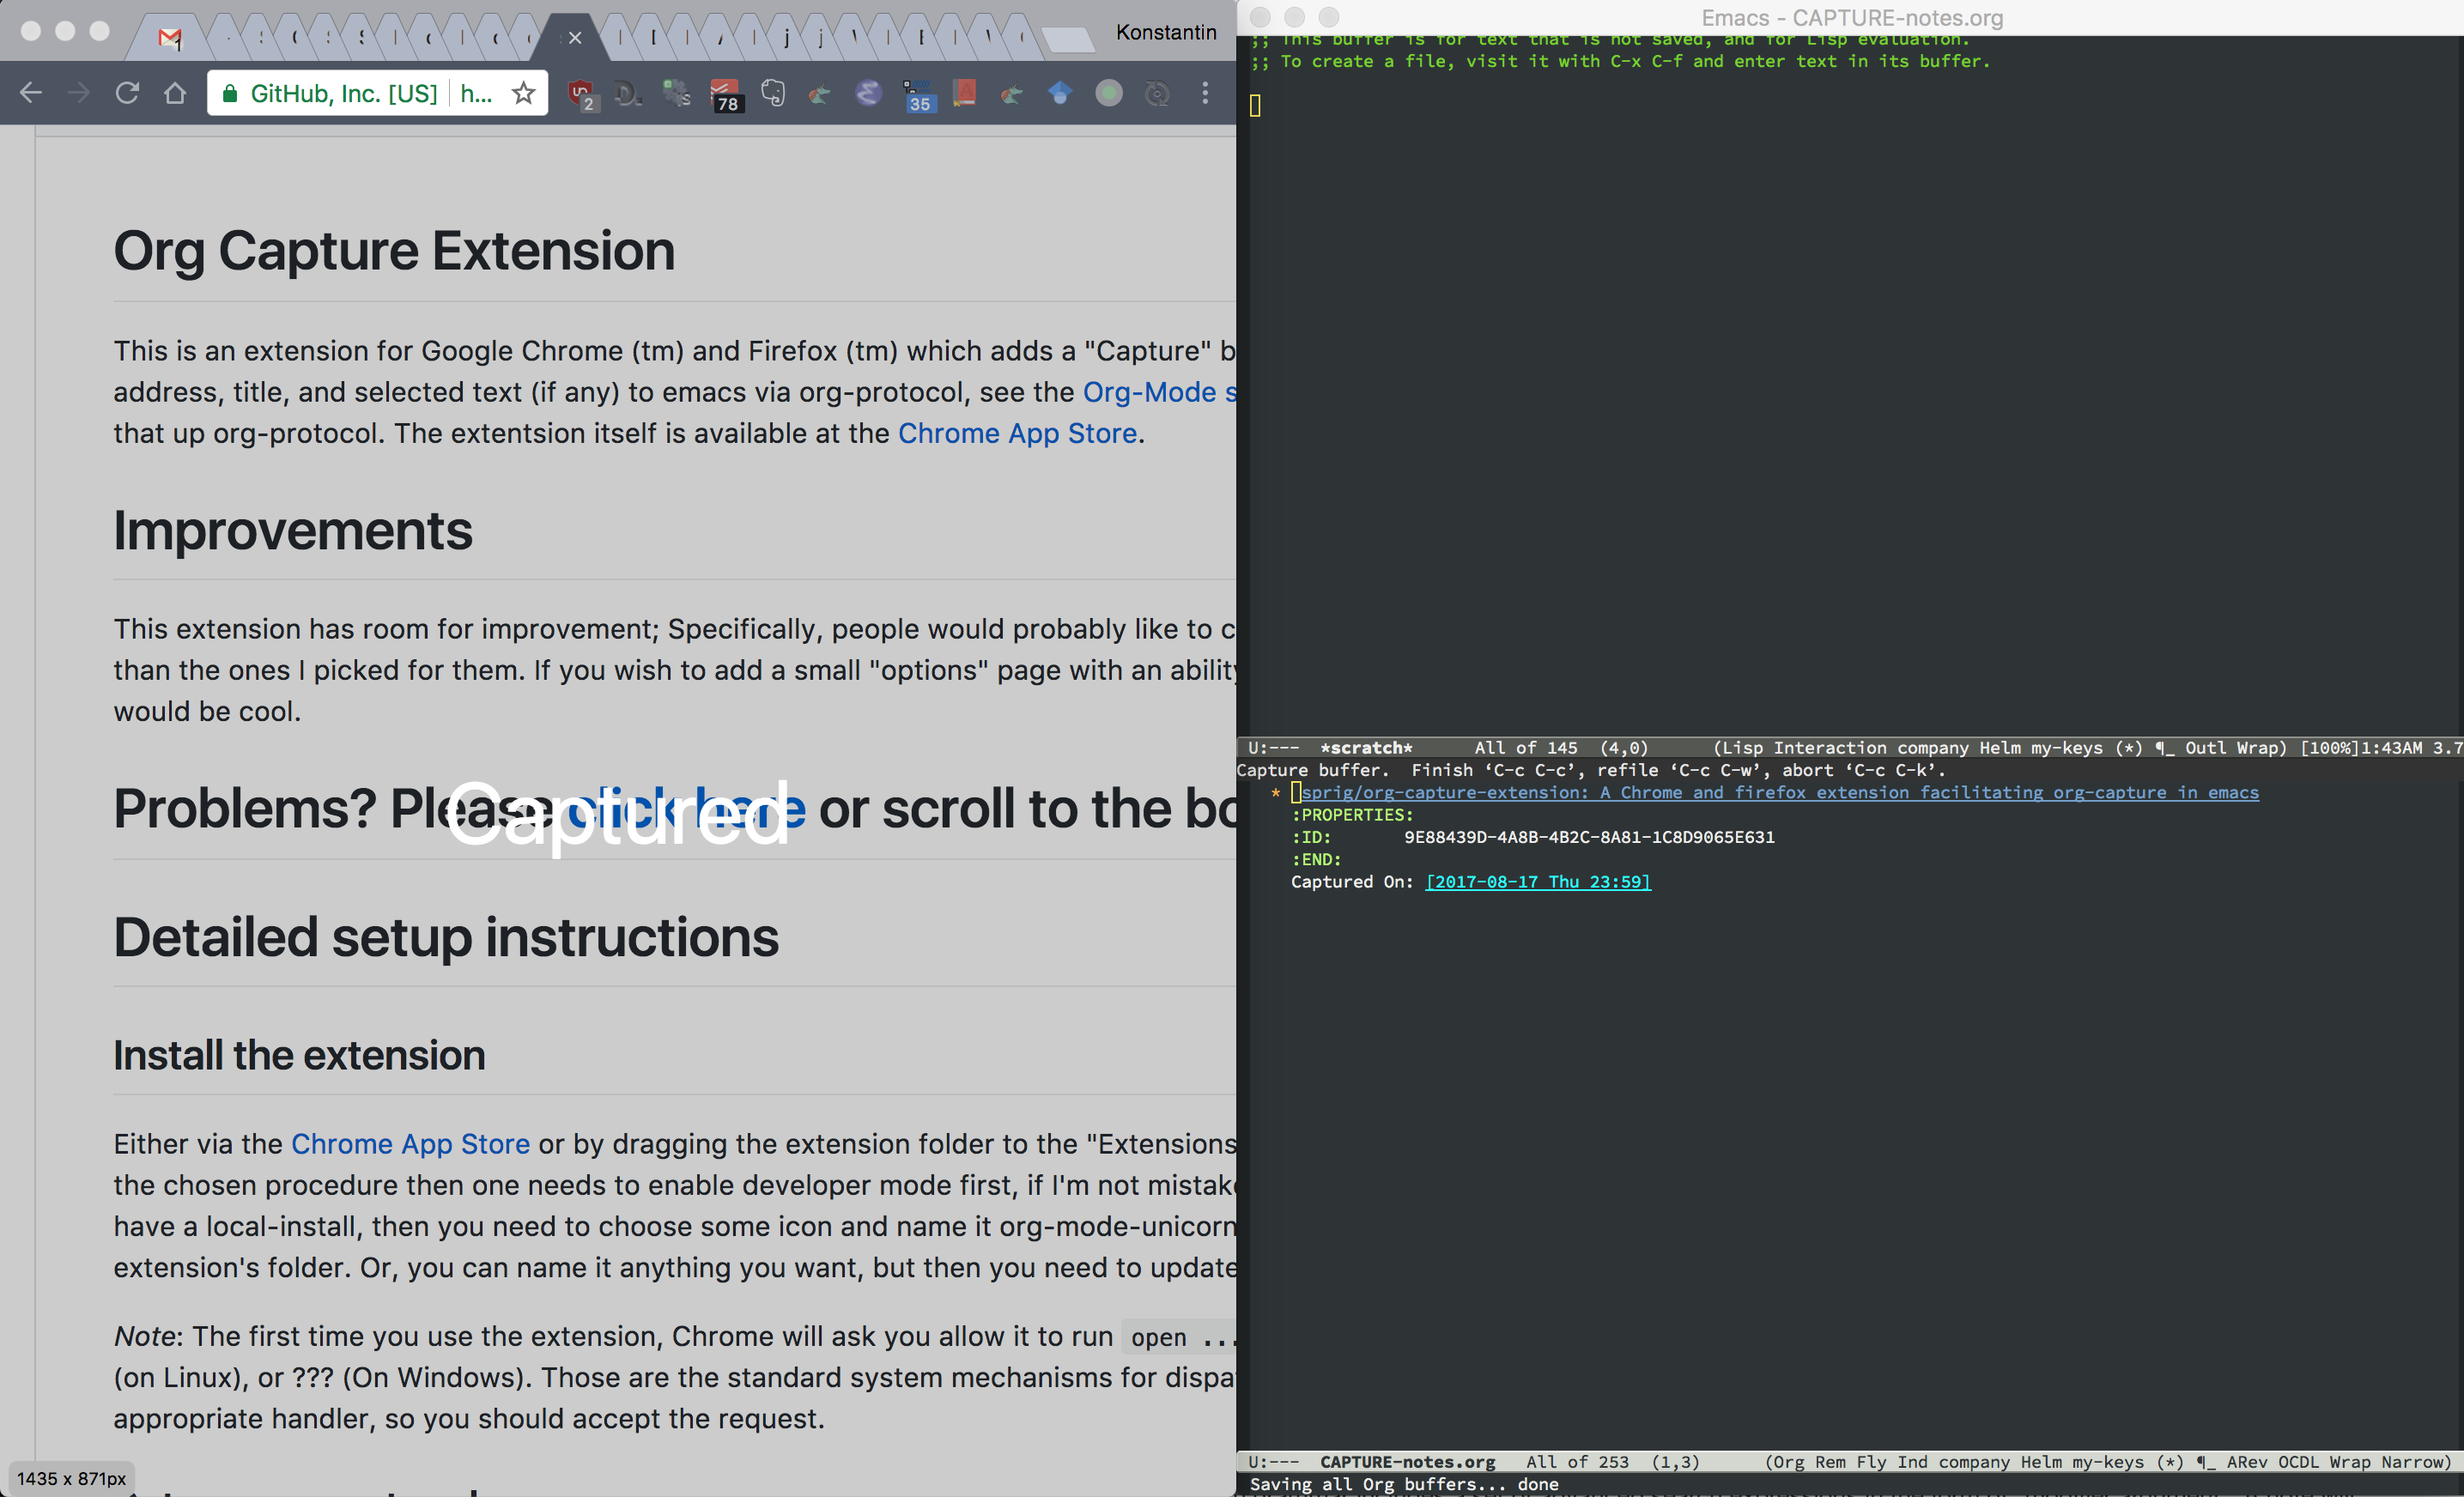 Example Usage Screenshot